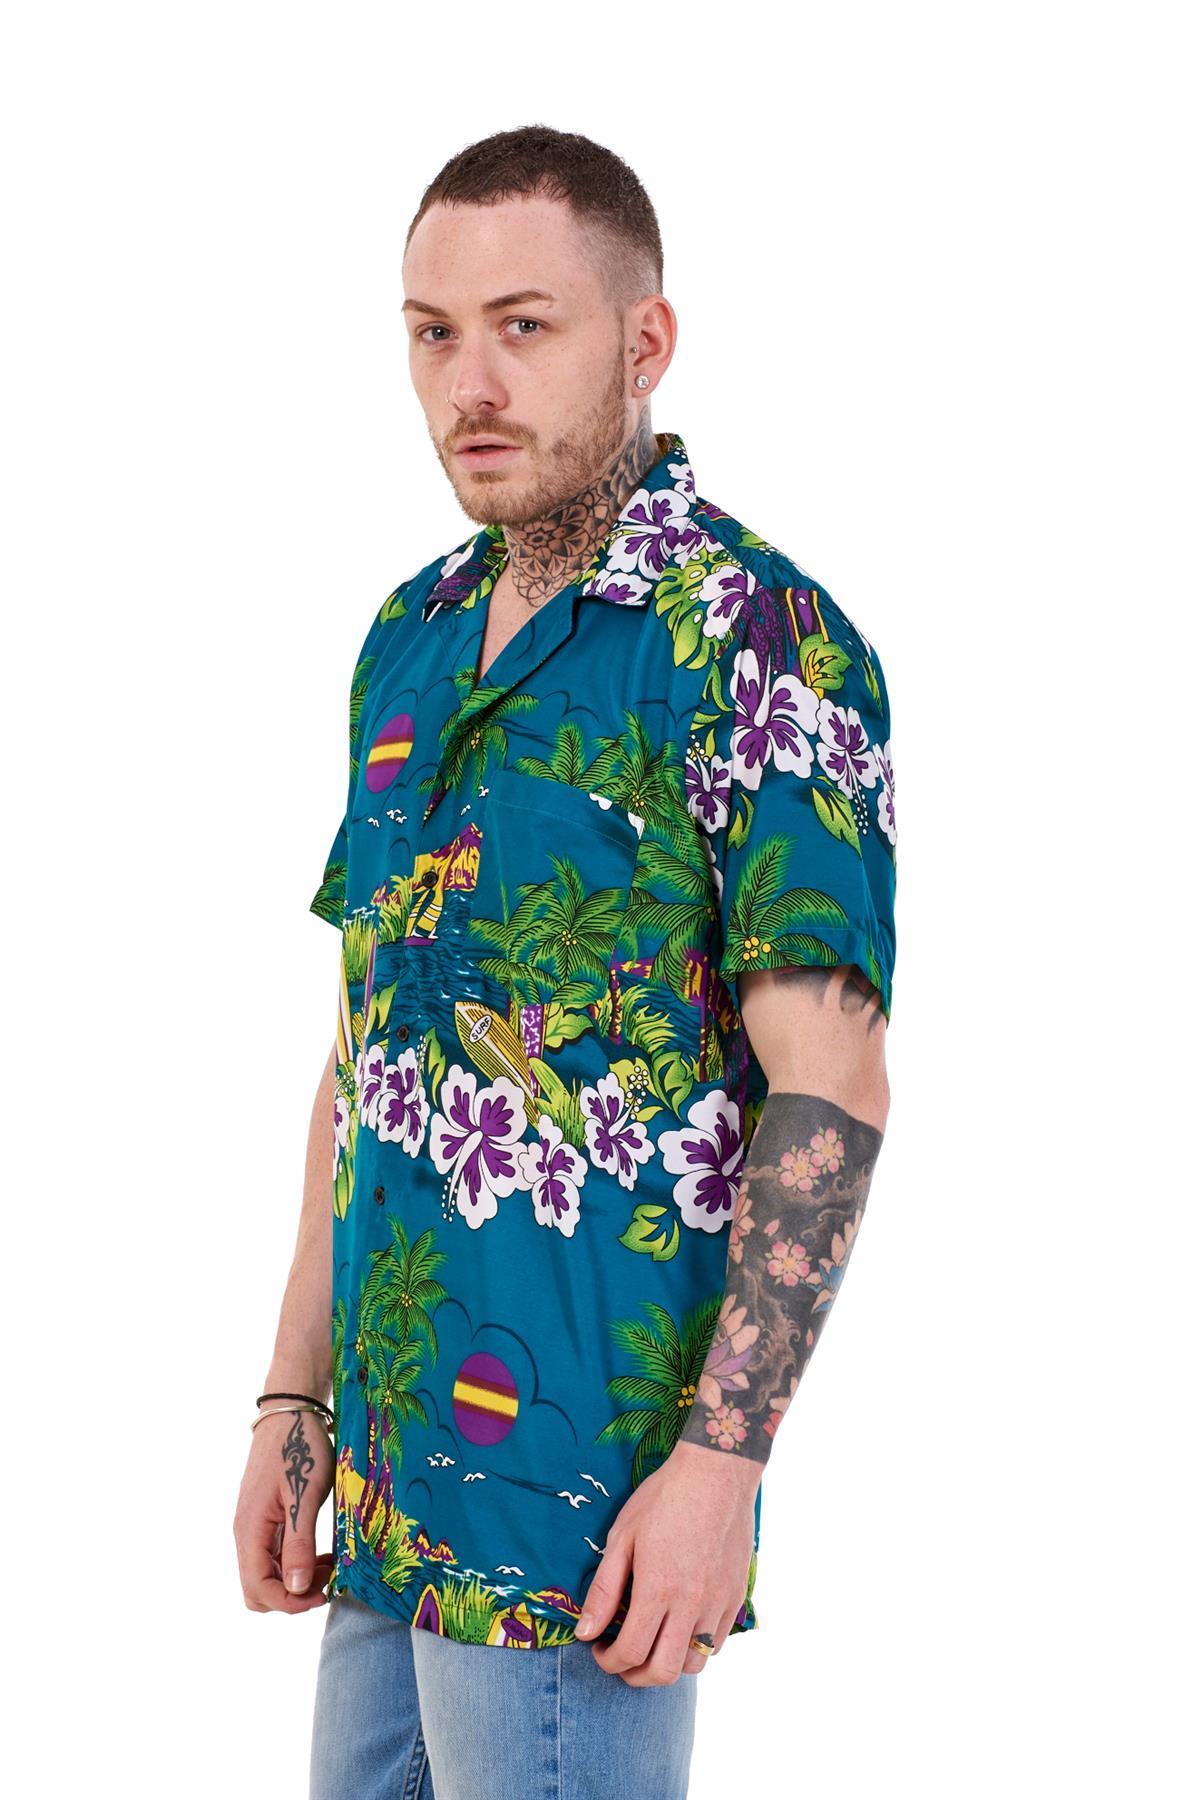 Mens-Hawaiian-Shirt-Multi-Colors-Print-Regular-Big-Size-Summer-Fancy-Dress-M-5XL thumbnail 9